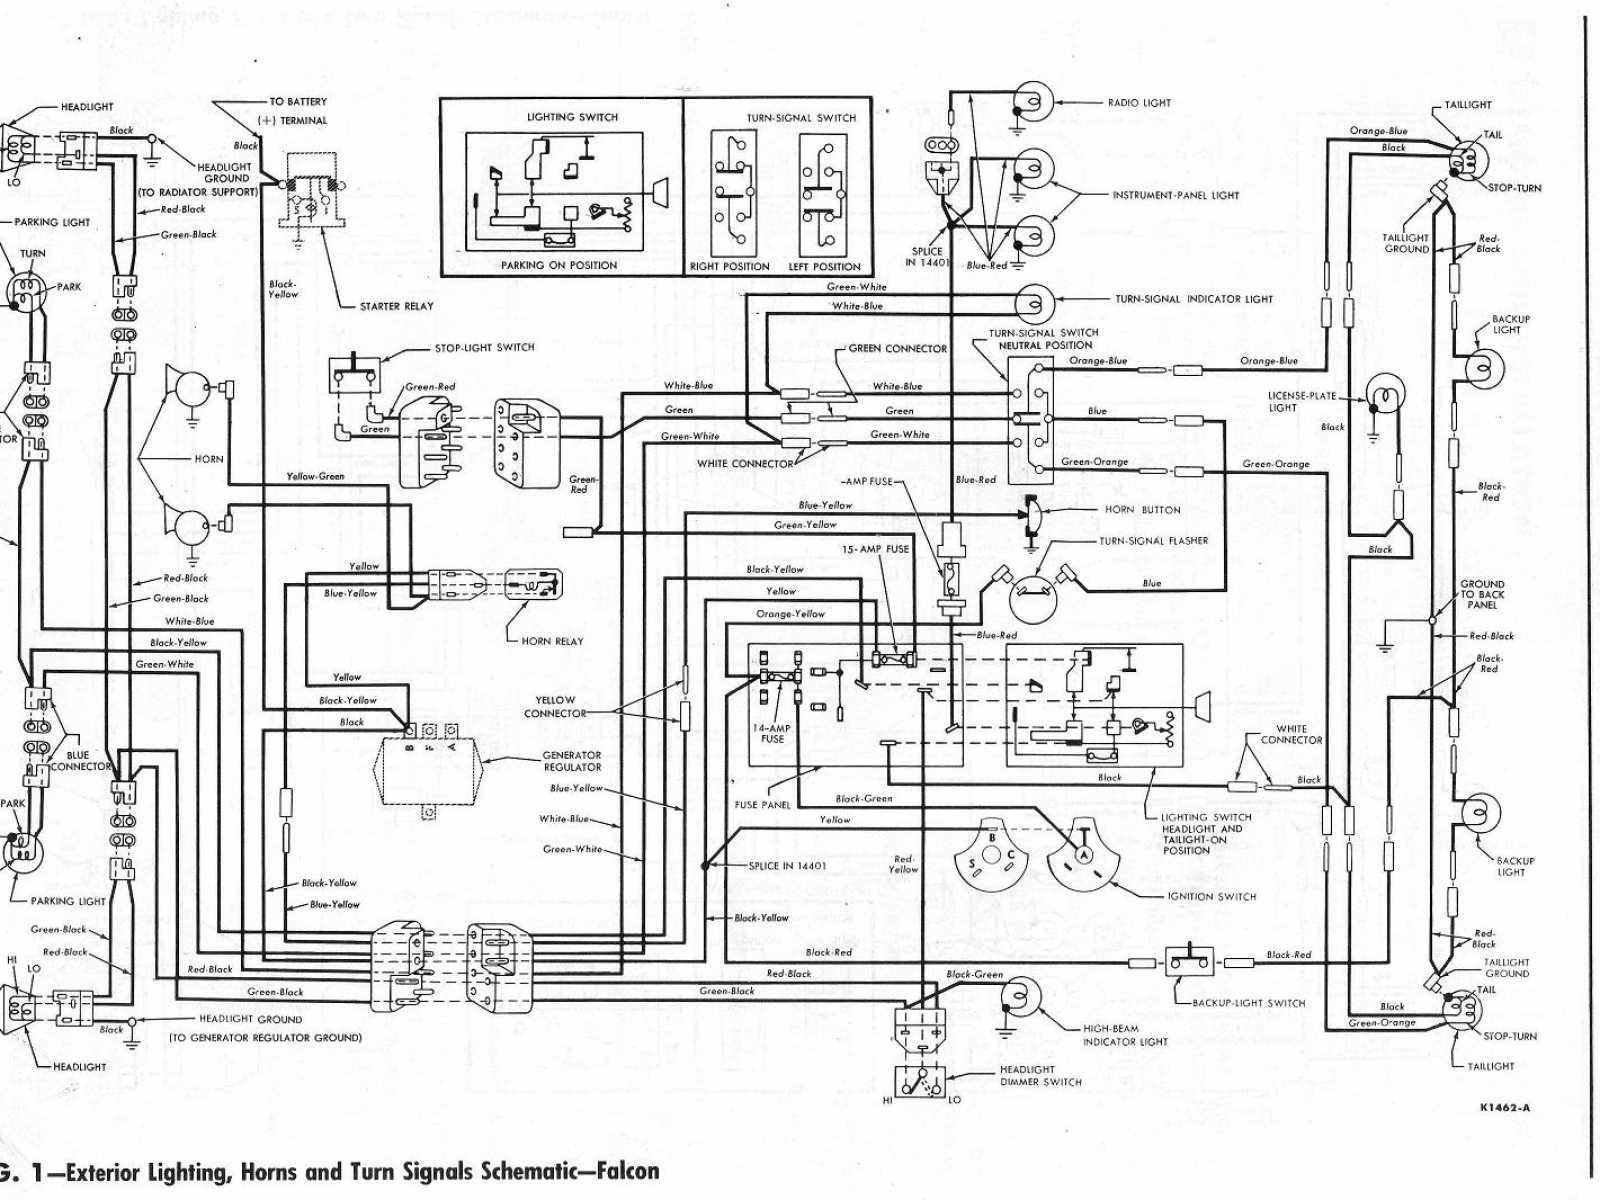 hight resolution of studebaker wiring harness wiring diagram expert 1948 studebaker wiring harness studebaker wiring harness